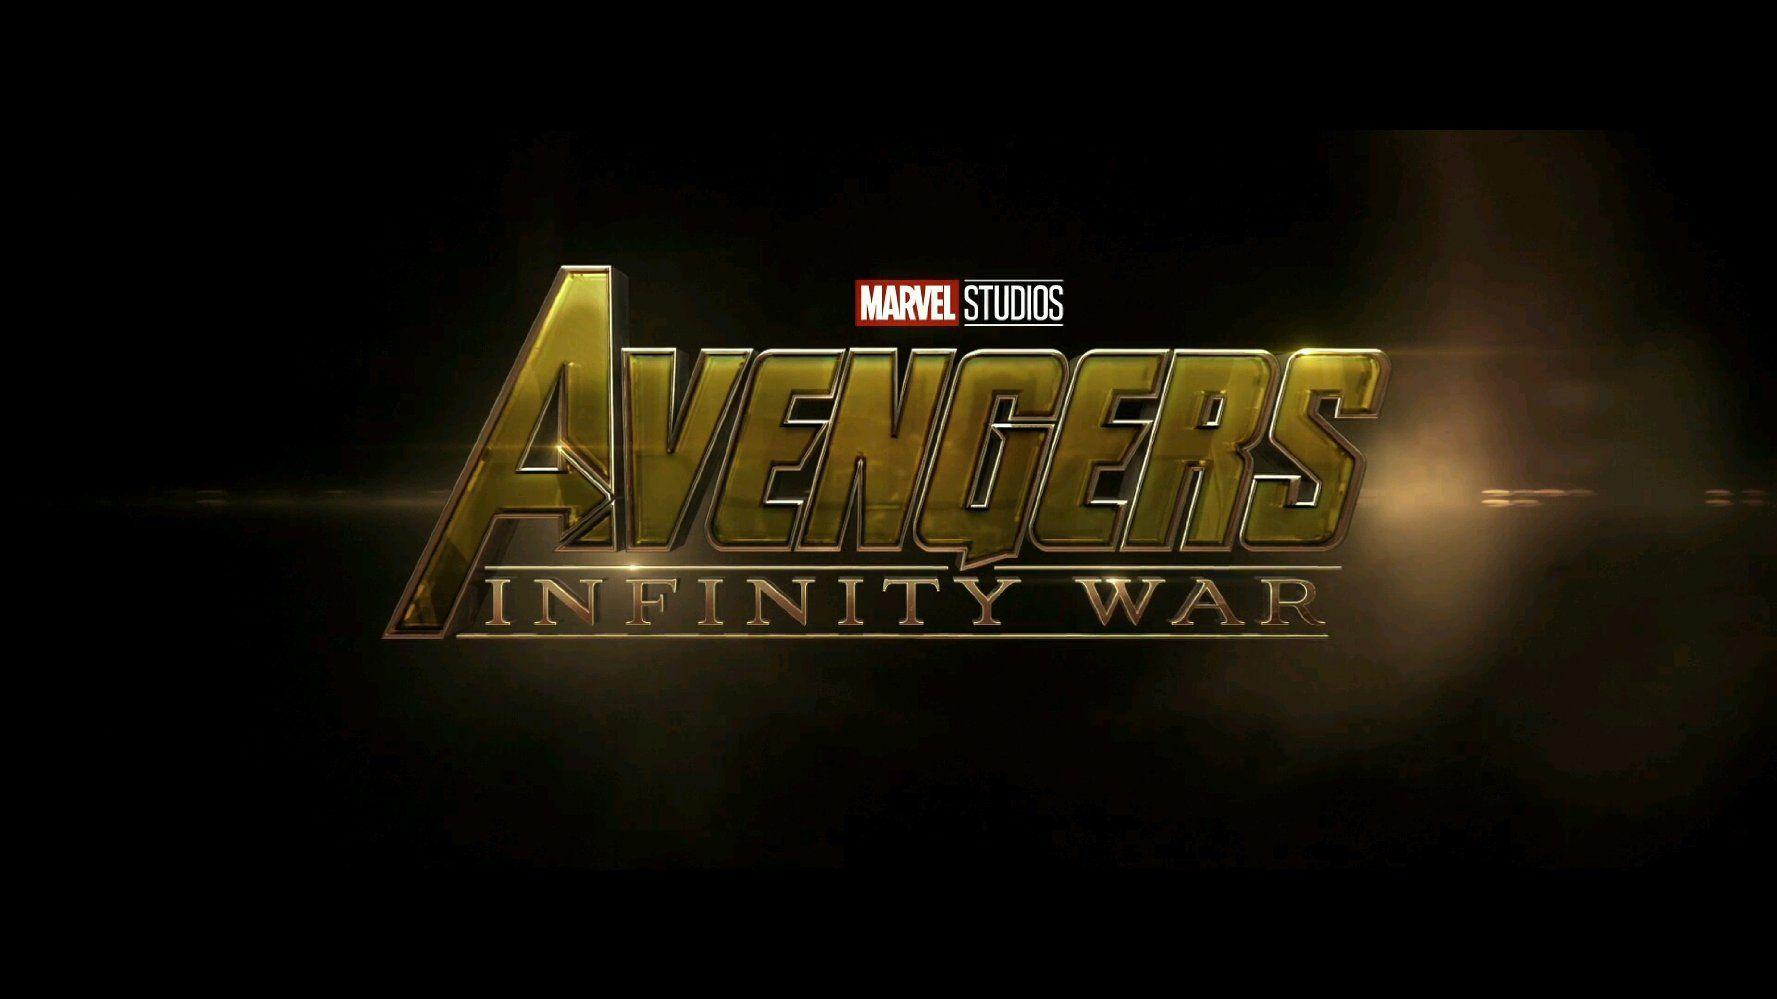 Avengers Infinity War Pelicula Completa En Espanol Avengers